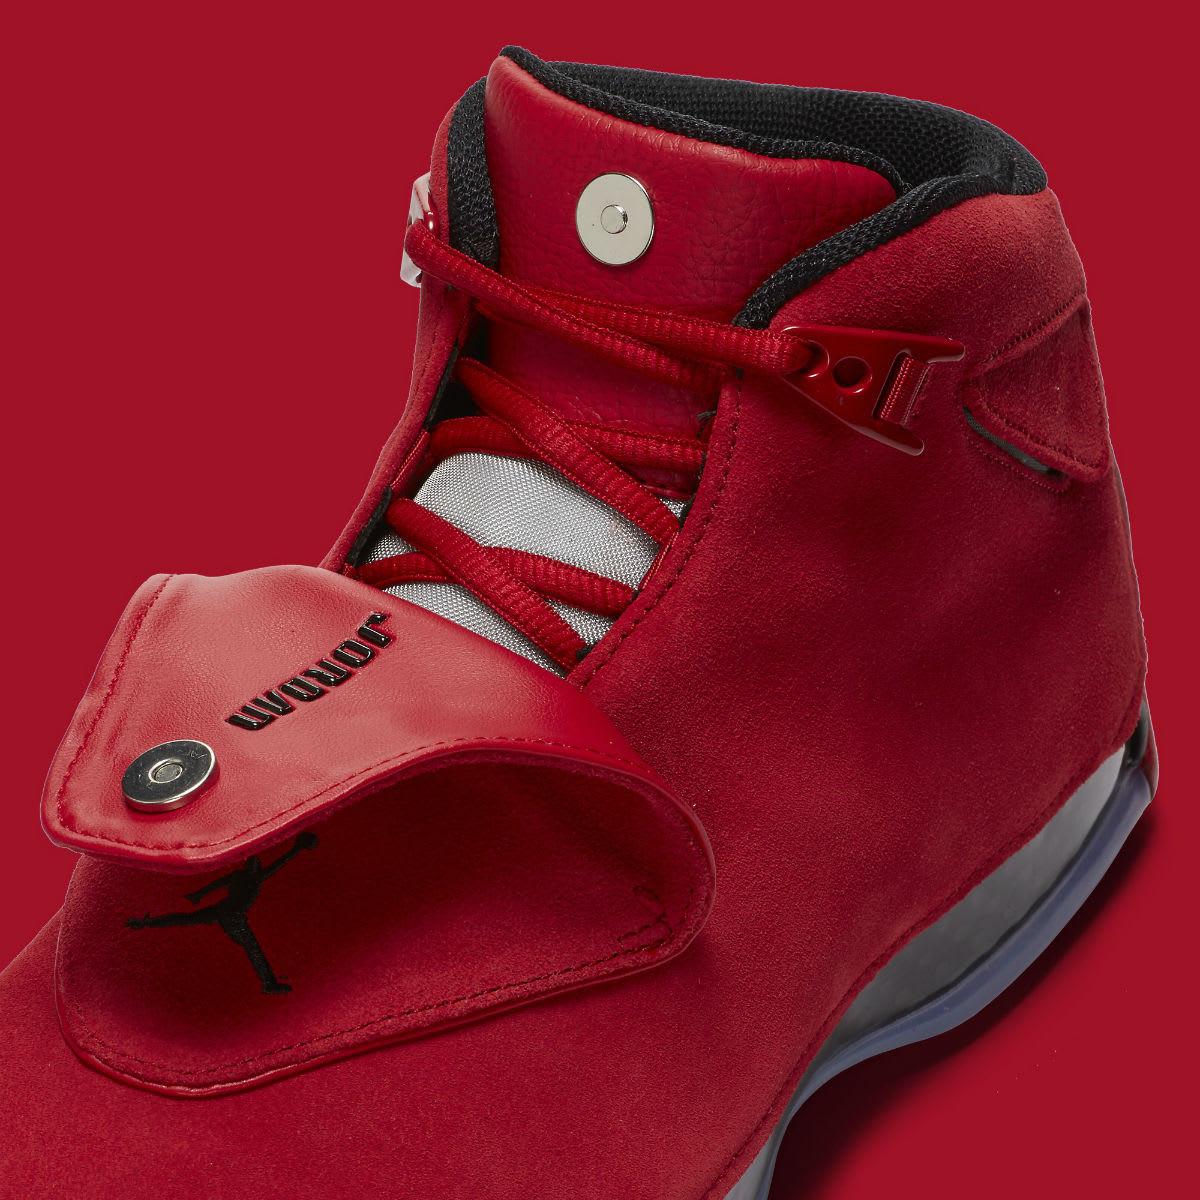 new styles b1a9d 847fb chaussure air jordan 6 retro pour homme ca